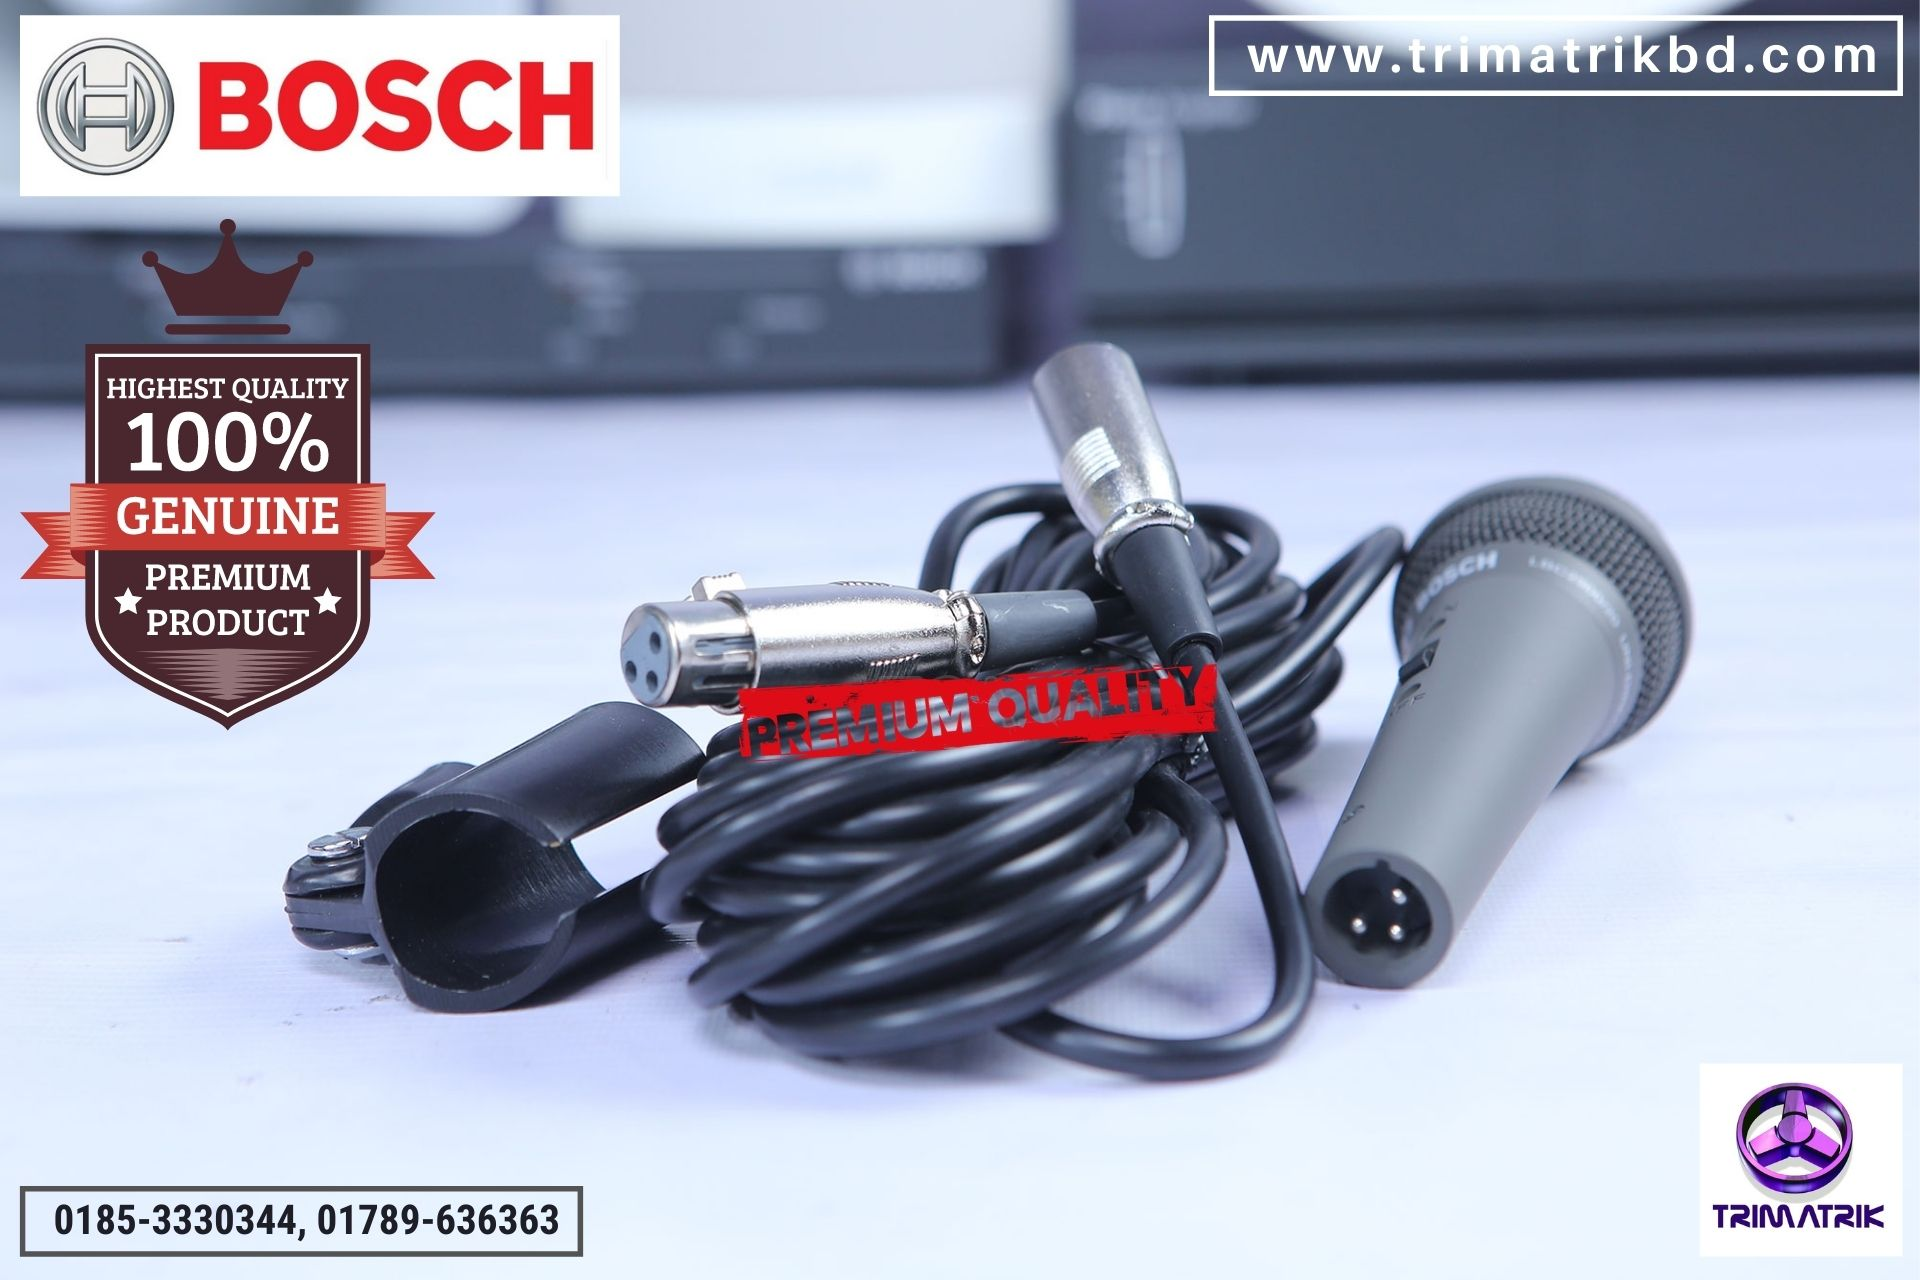 BOSCH LBC2900/20 Bangladesh